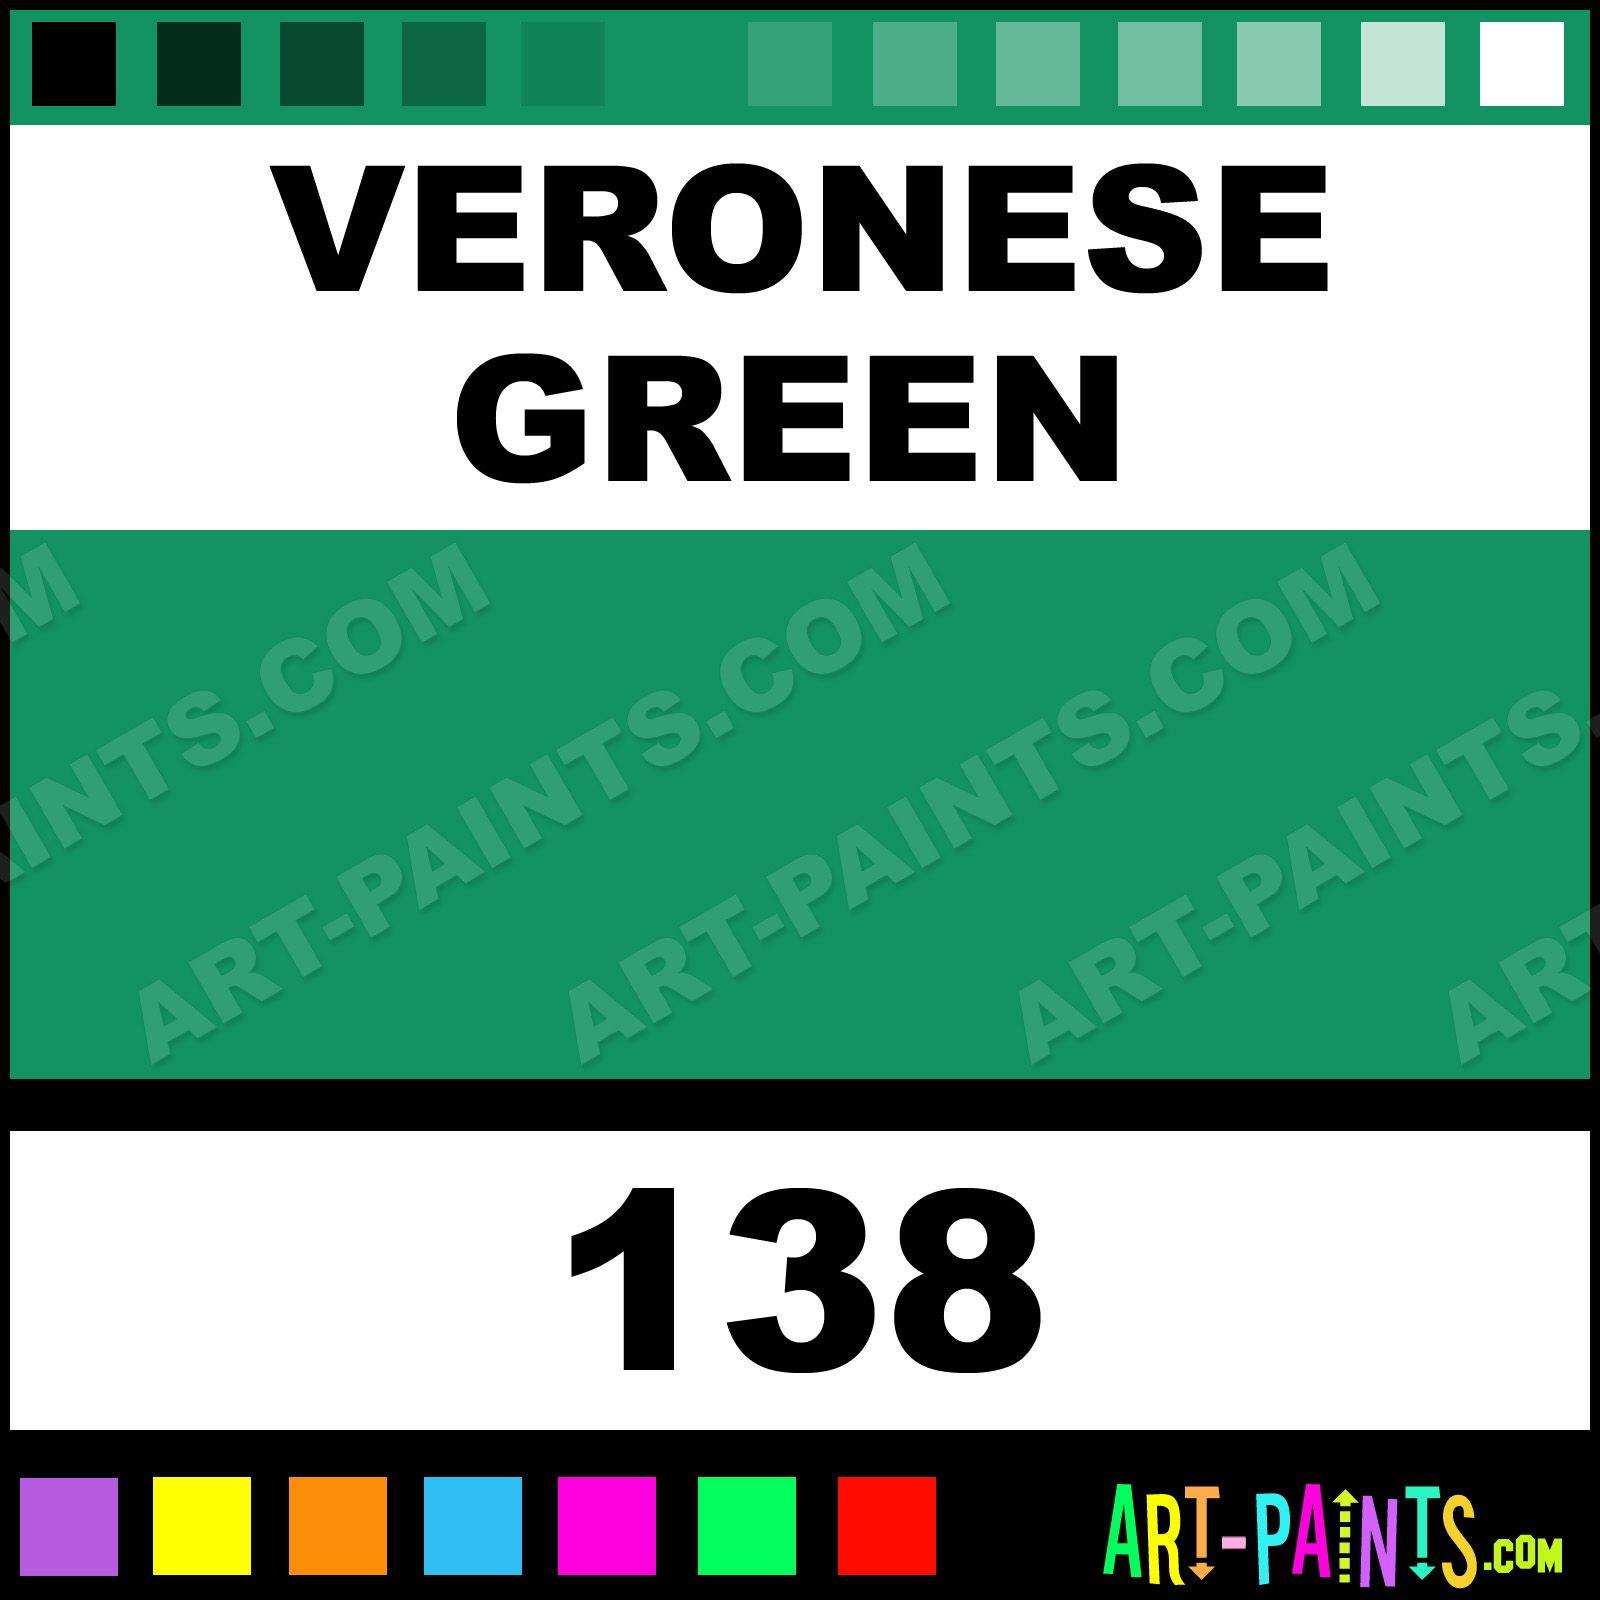 Veronese Green Pebeo Watercolor Paints 138 Veronese Green Paint Veronese Green Color Fragonard Pebeo Paint 129262 Grey Artist Brown Art Grey Art